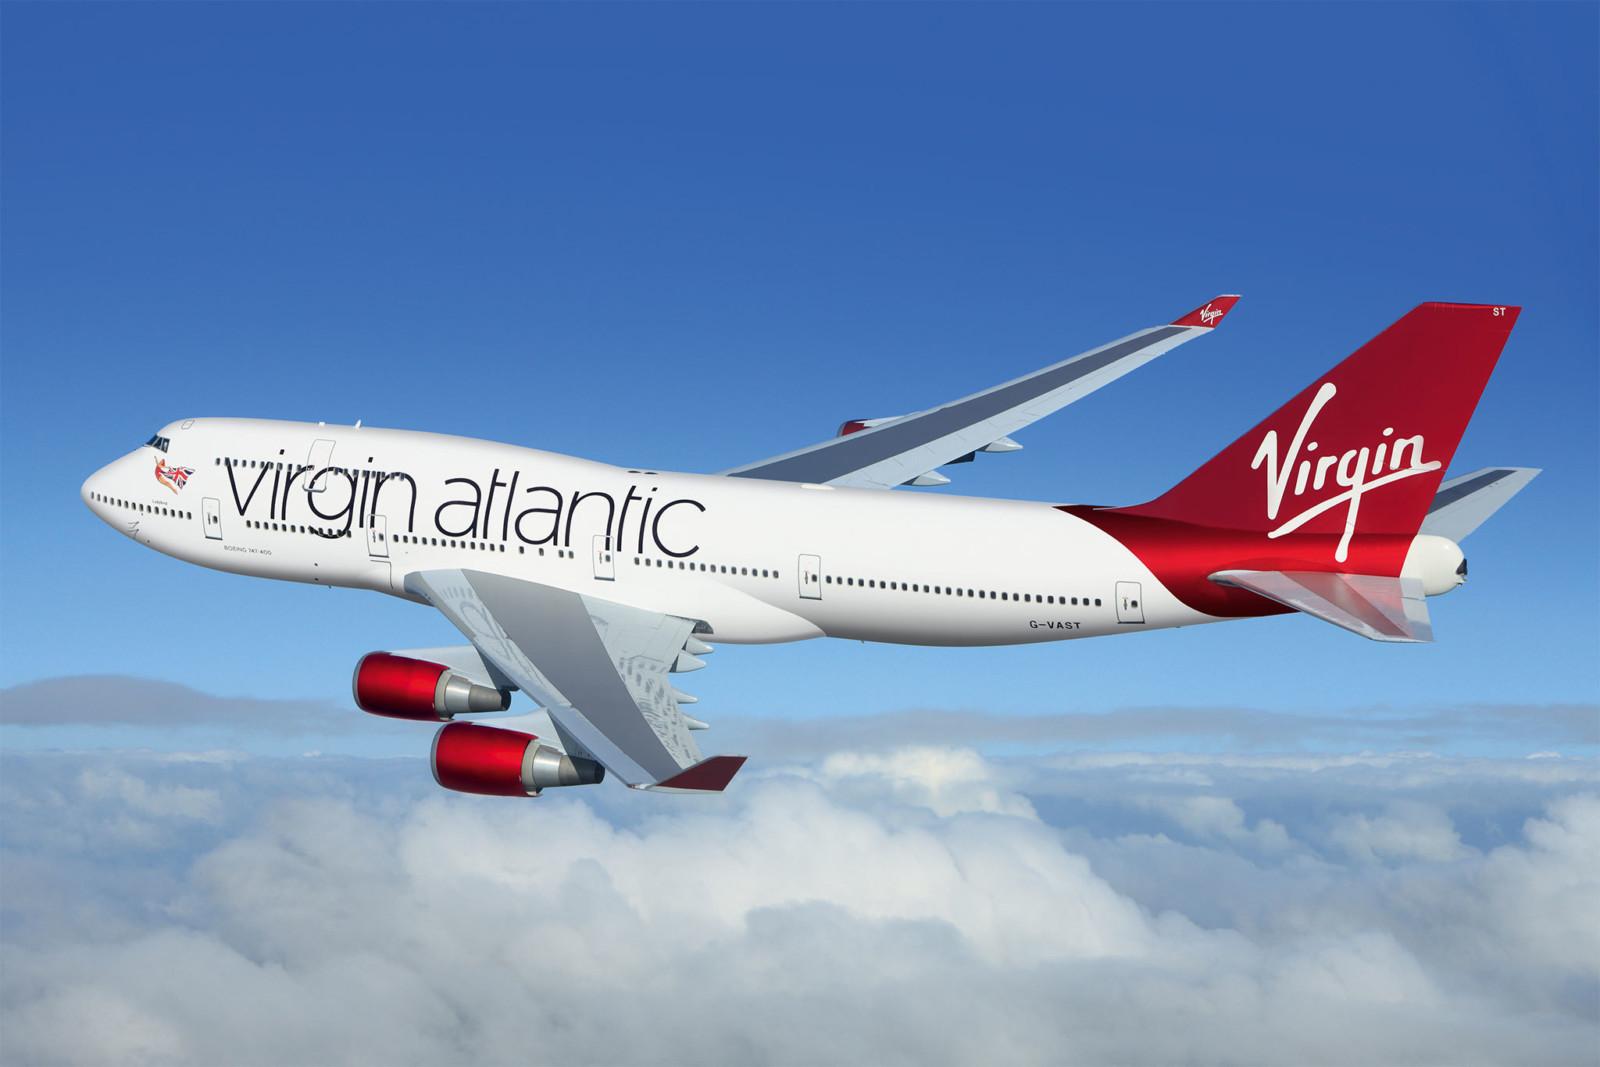 Virgin Atlantic photo